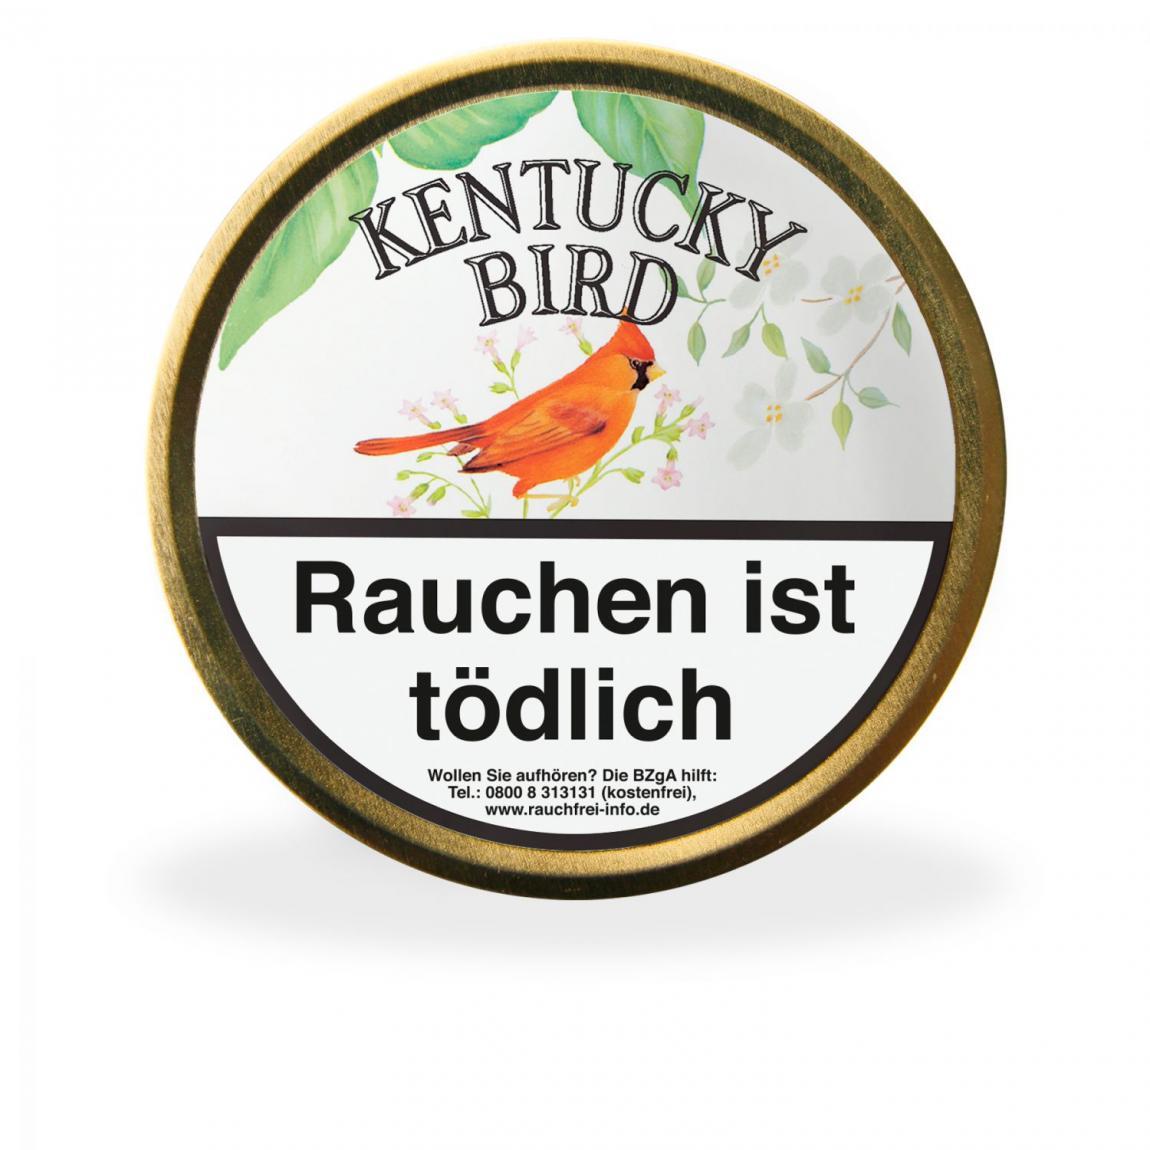 Kentucky Bird 100g Dose